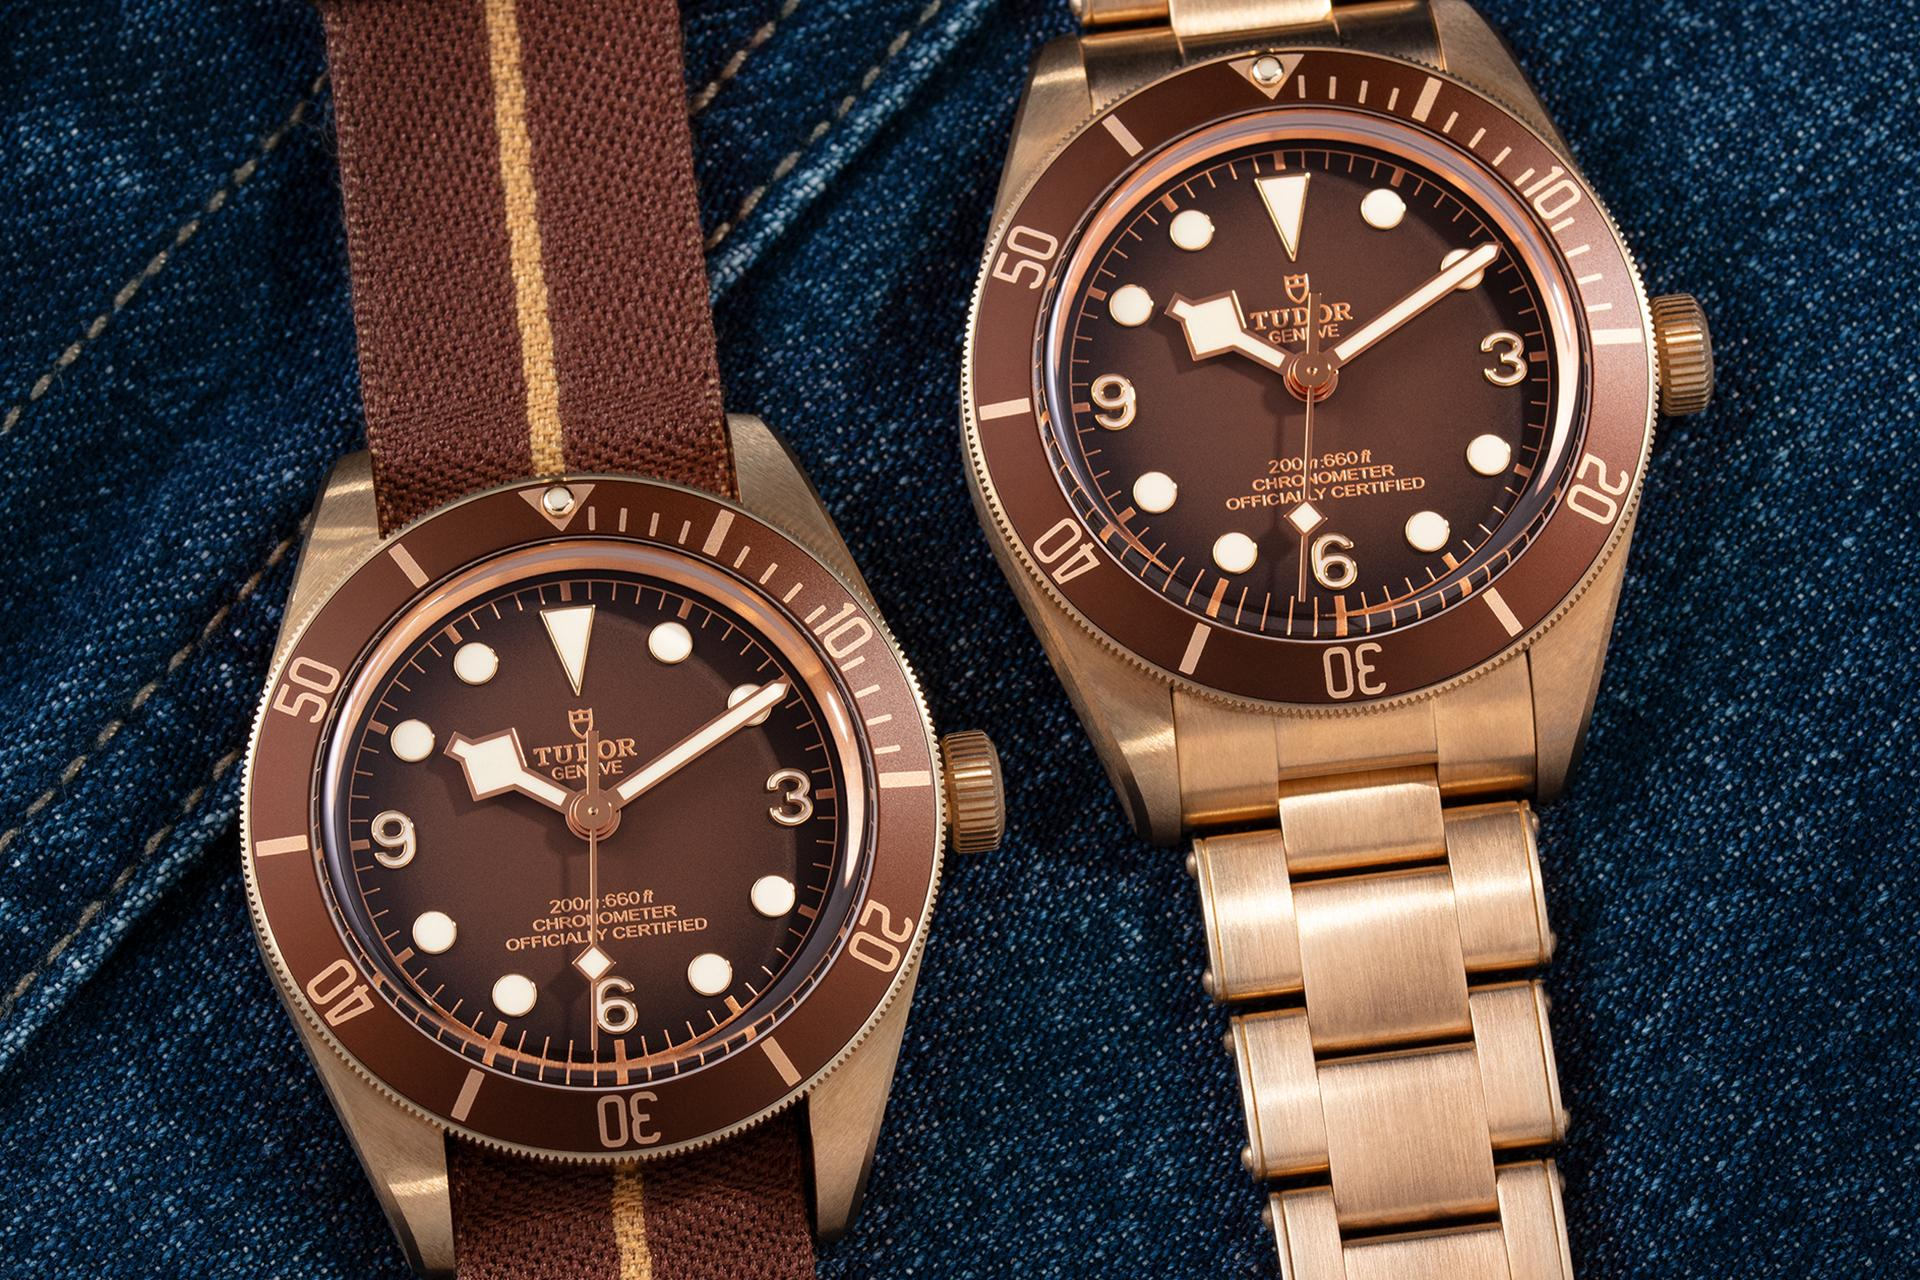 Tudor Black Bay Fifty-Eight Bronze, brown NATO strap, new Tudor watch 2021